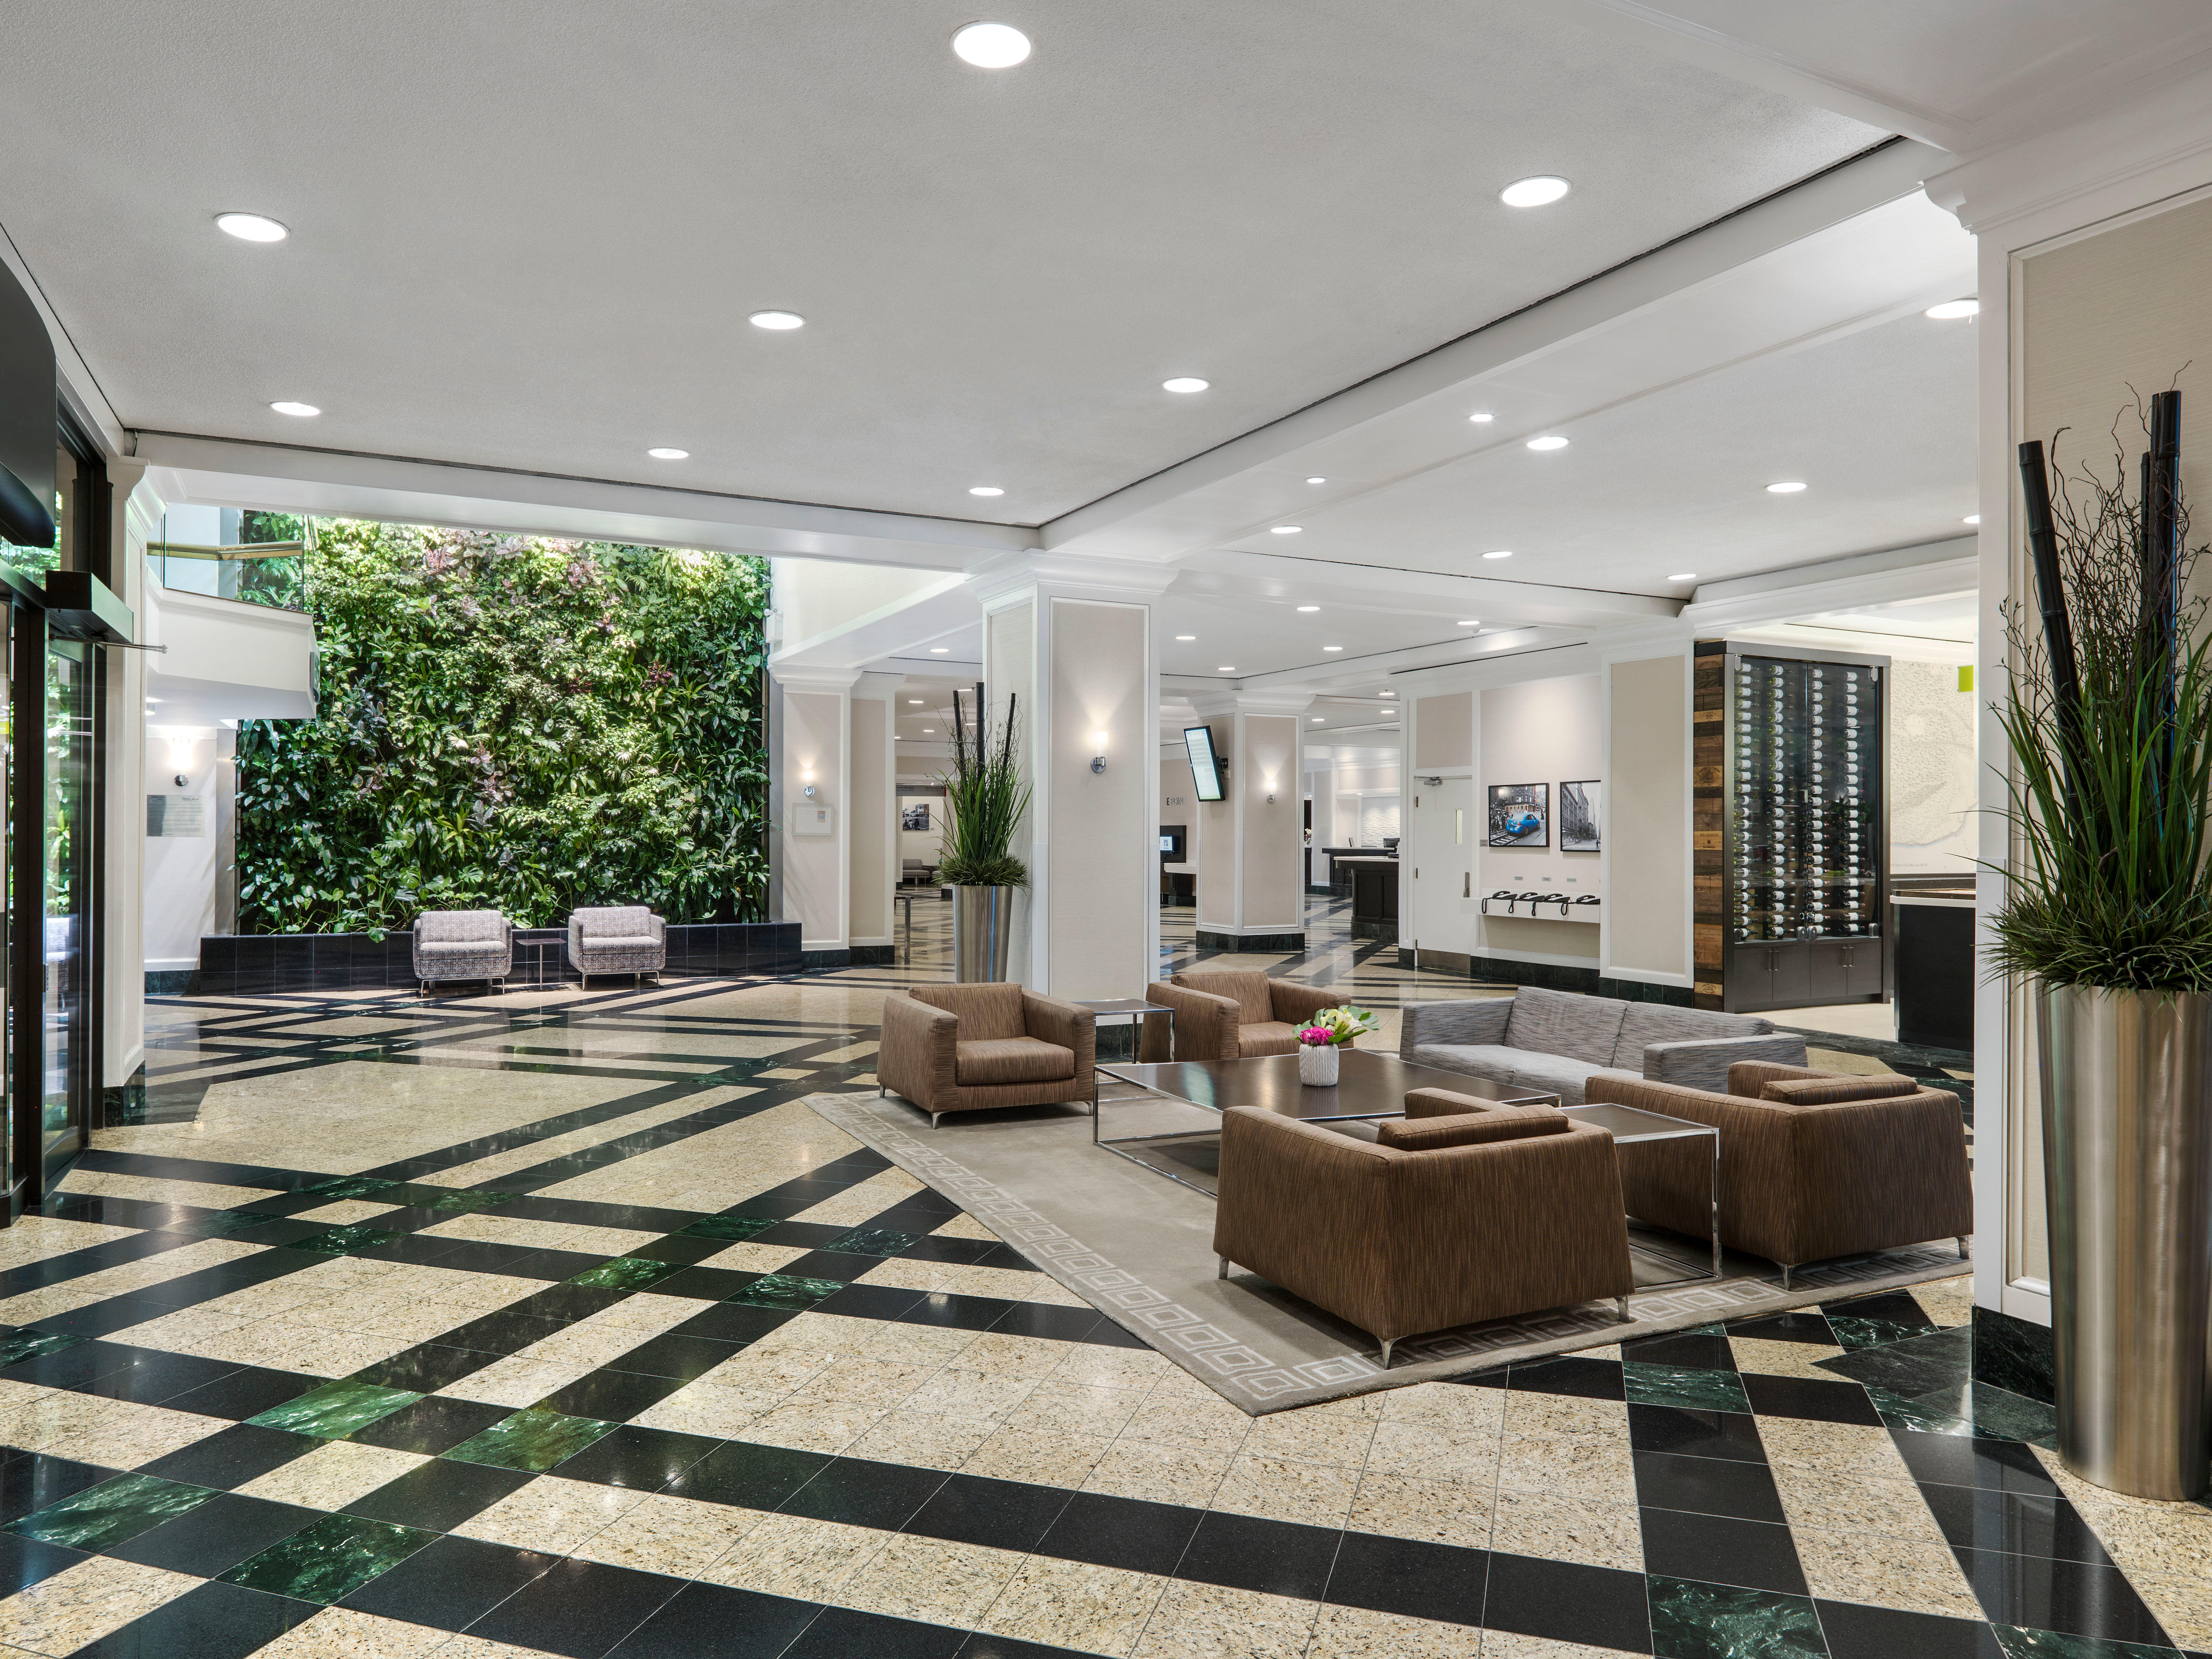 CHELSEA HOTEL, TORONTO in Toronto: Chelsea Hotel, Toronto Lobby